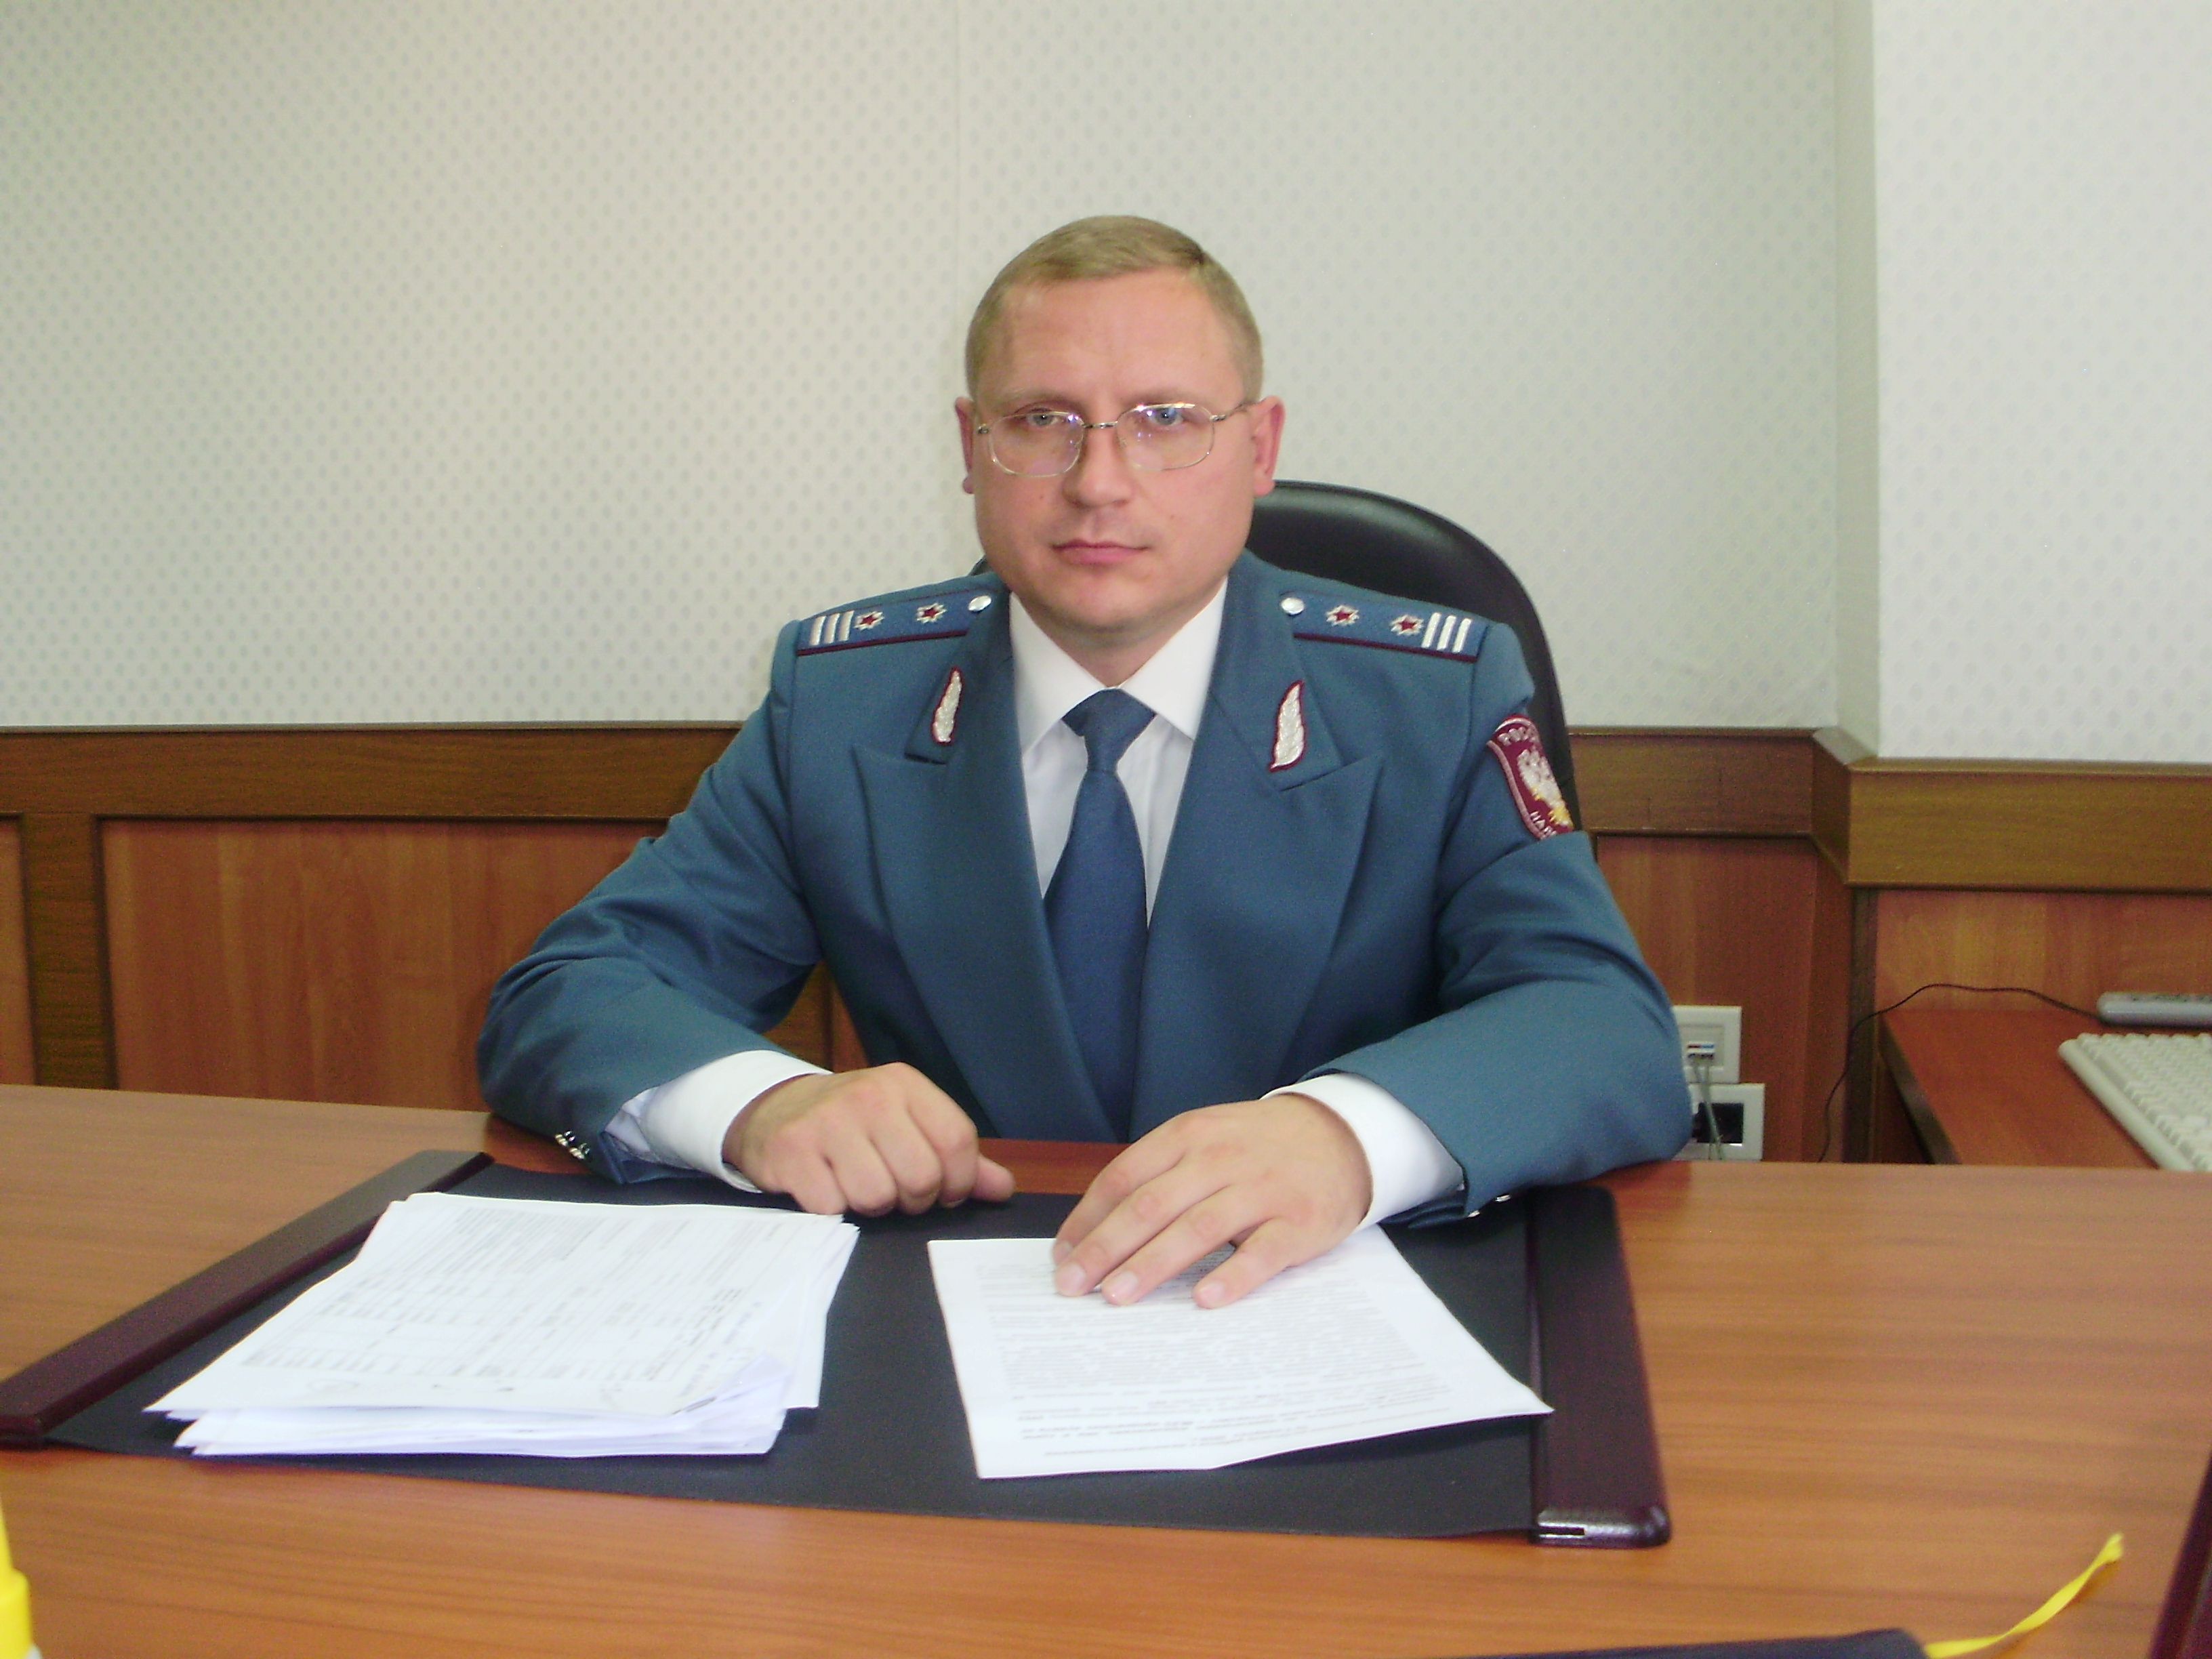 https://www.nalog.ru/cdn/image/16945/original.JPG